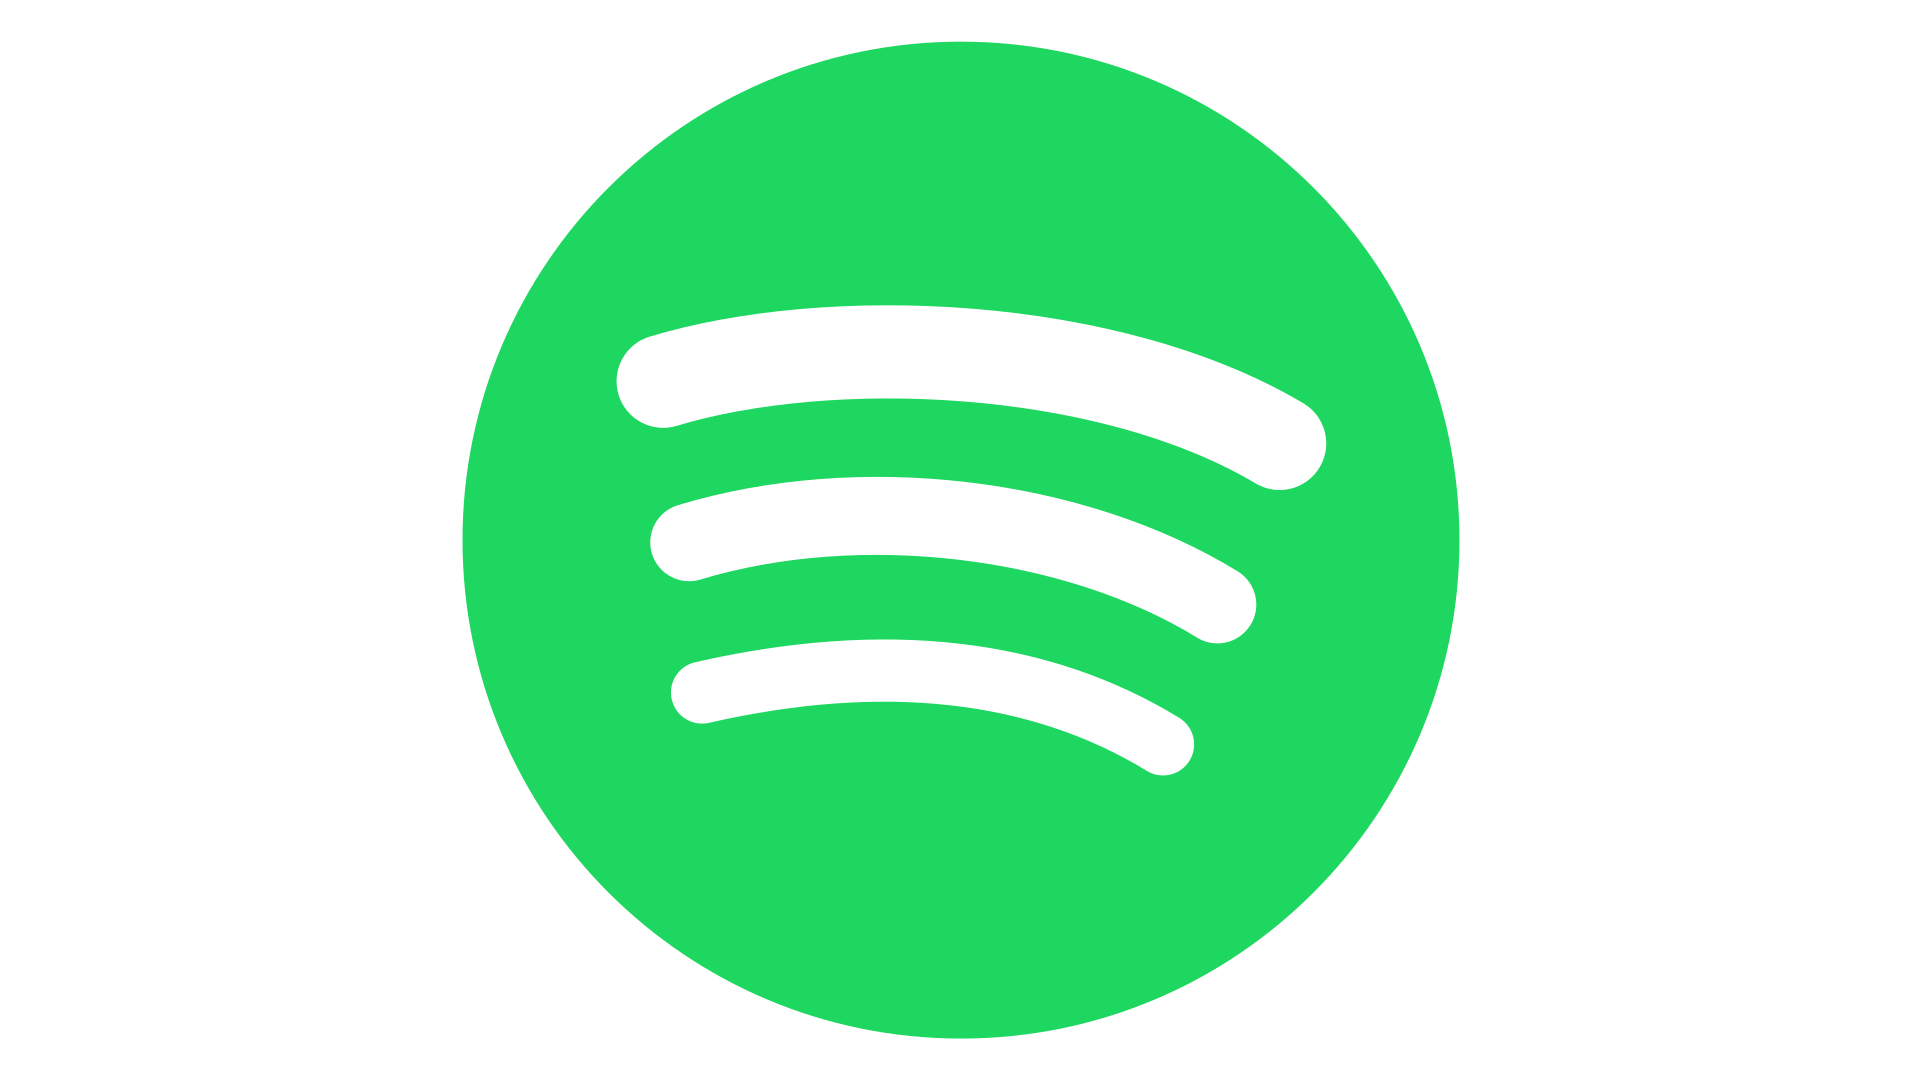 Spotify logo histoire et signification, evolution, symbole ...